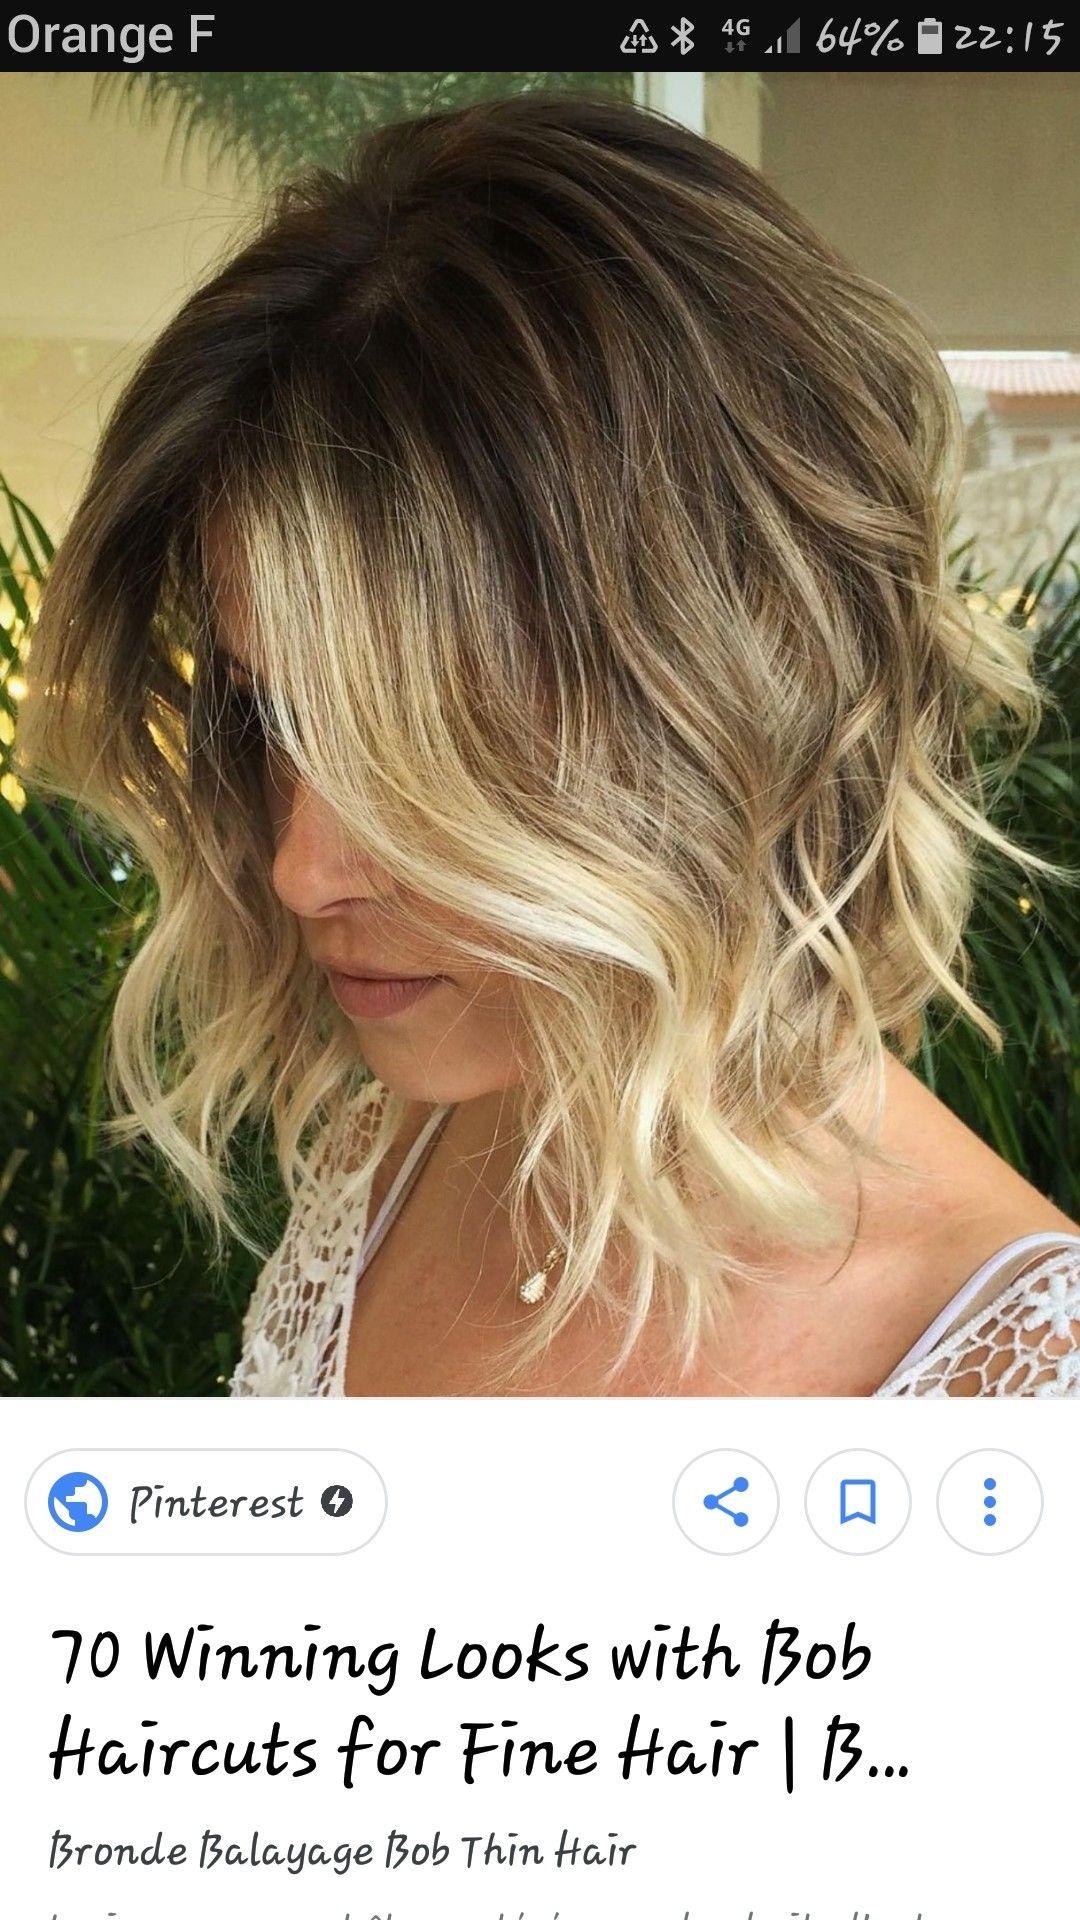 Pin By Xy Xy On Paletten Kaffeetische Pinterest Hair Hair